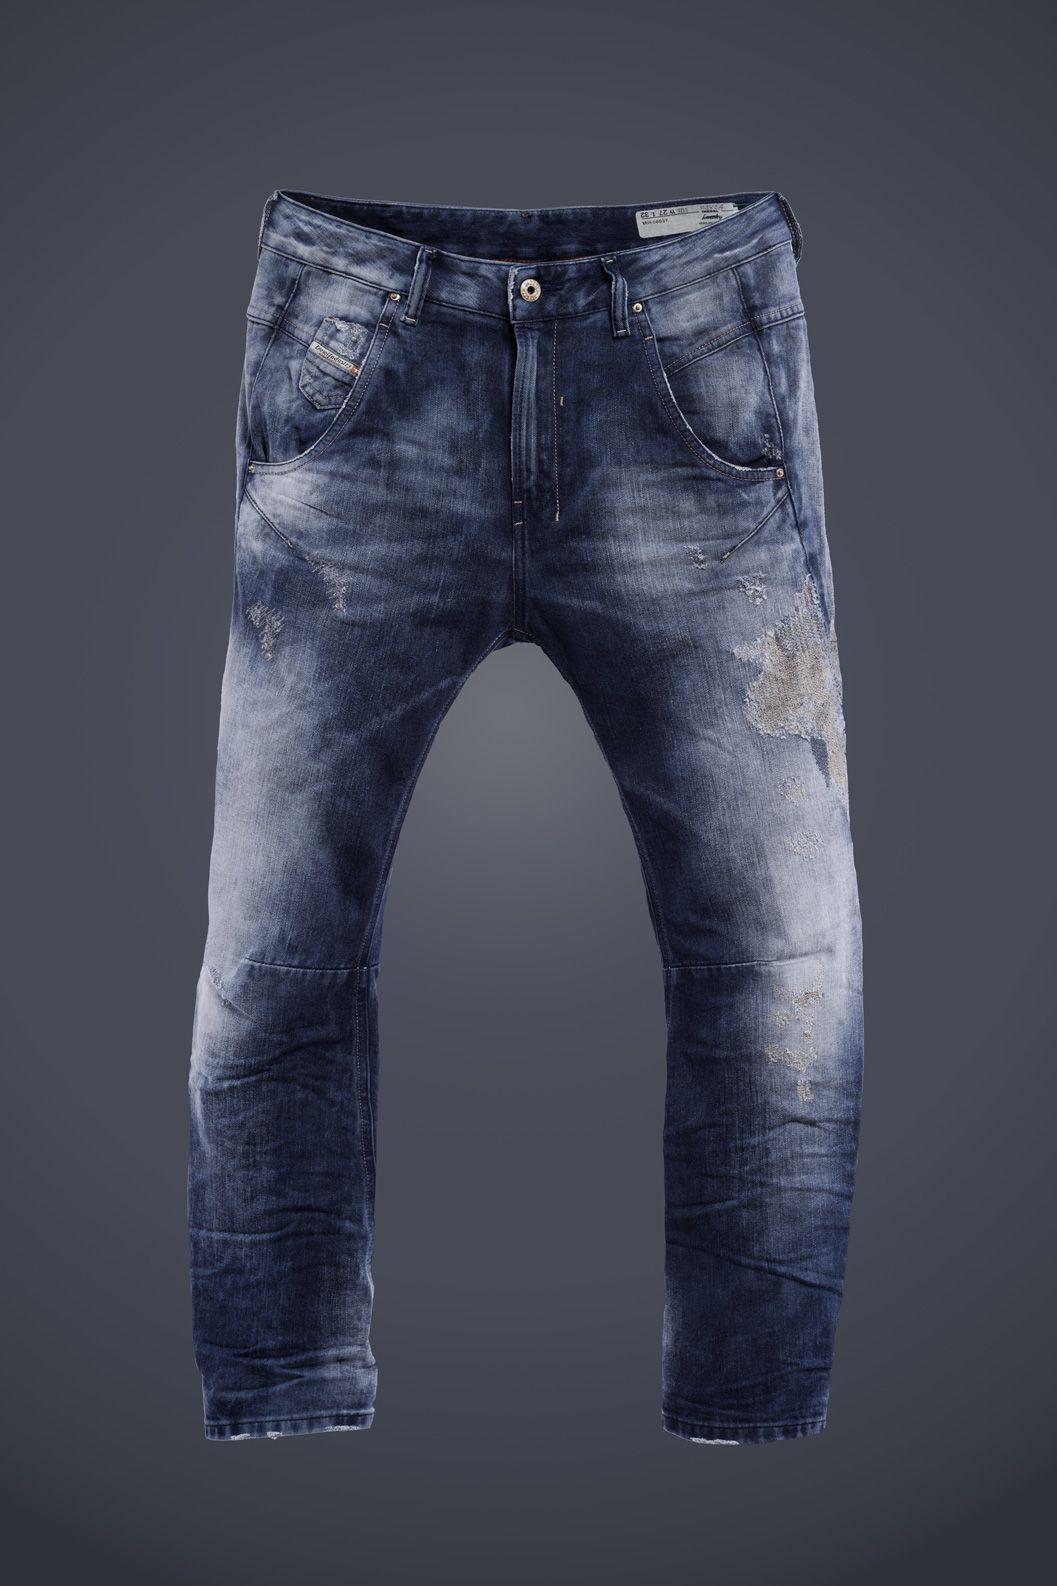 Pin De Eduardo Ramirez En Diesel Present Fall Winter 2013 Main Denim Collection Jeans Hombre Pantalones Jeans Pantalones Cortos Masculinos